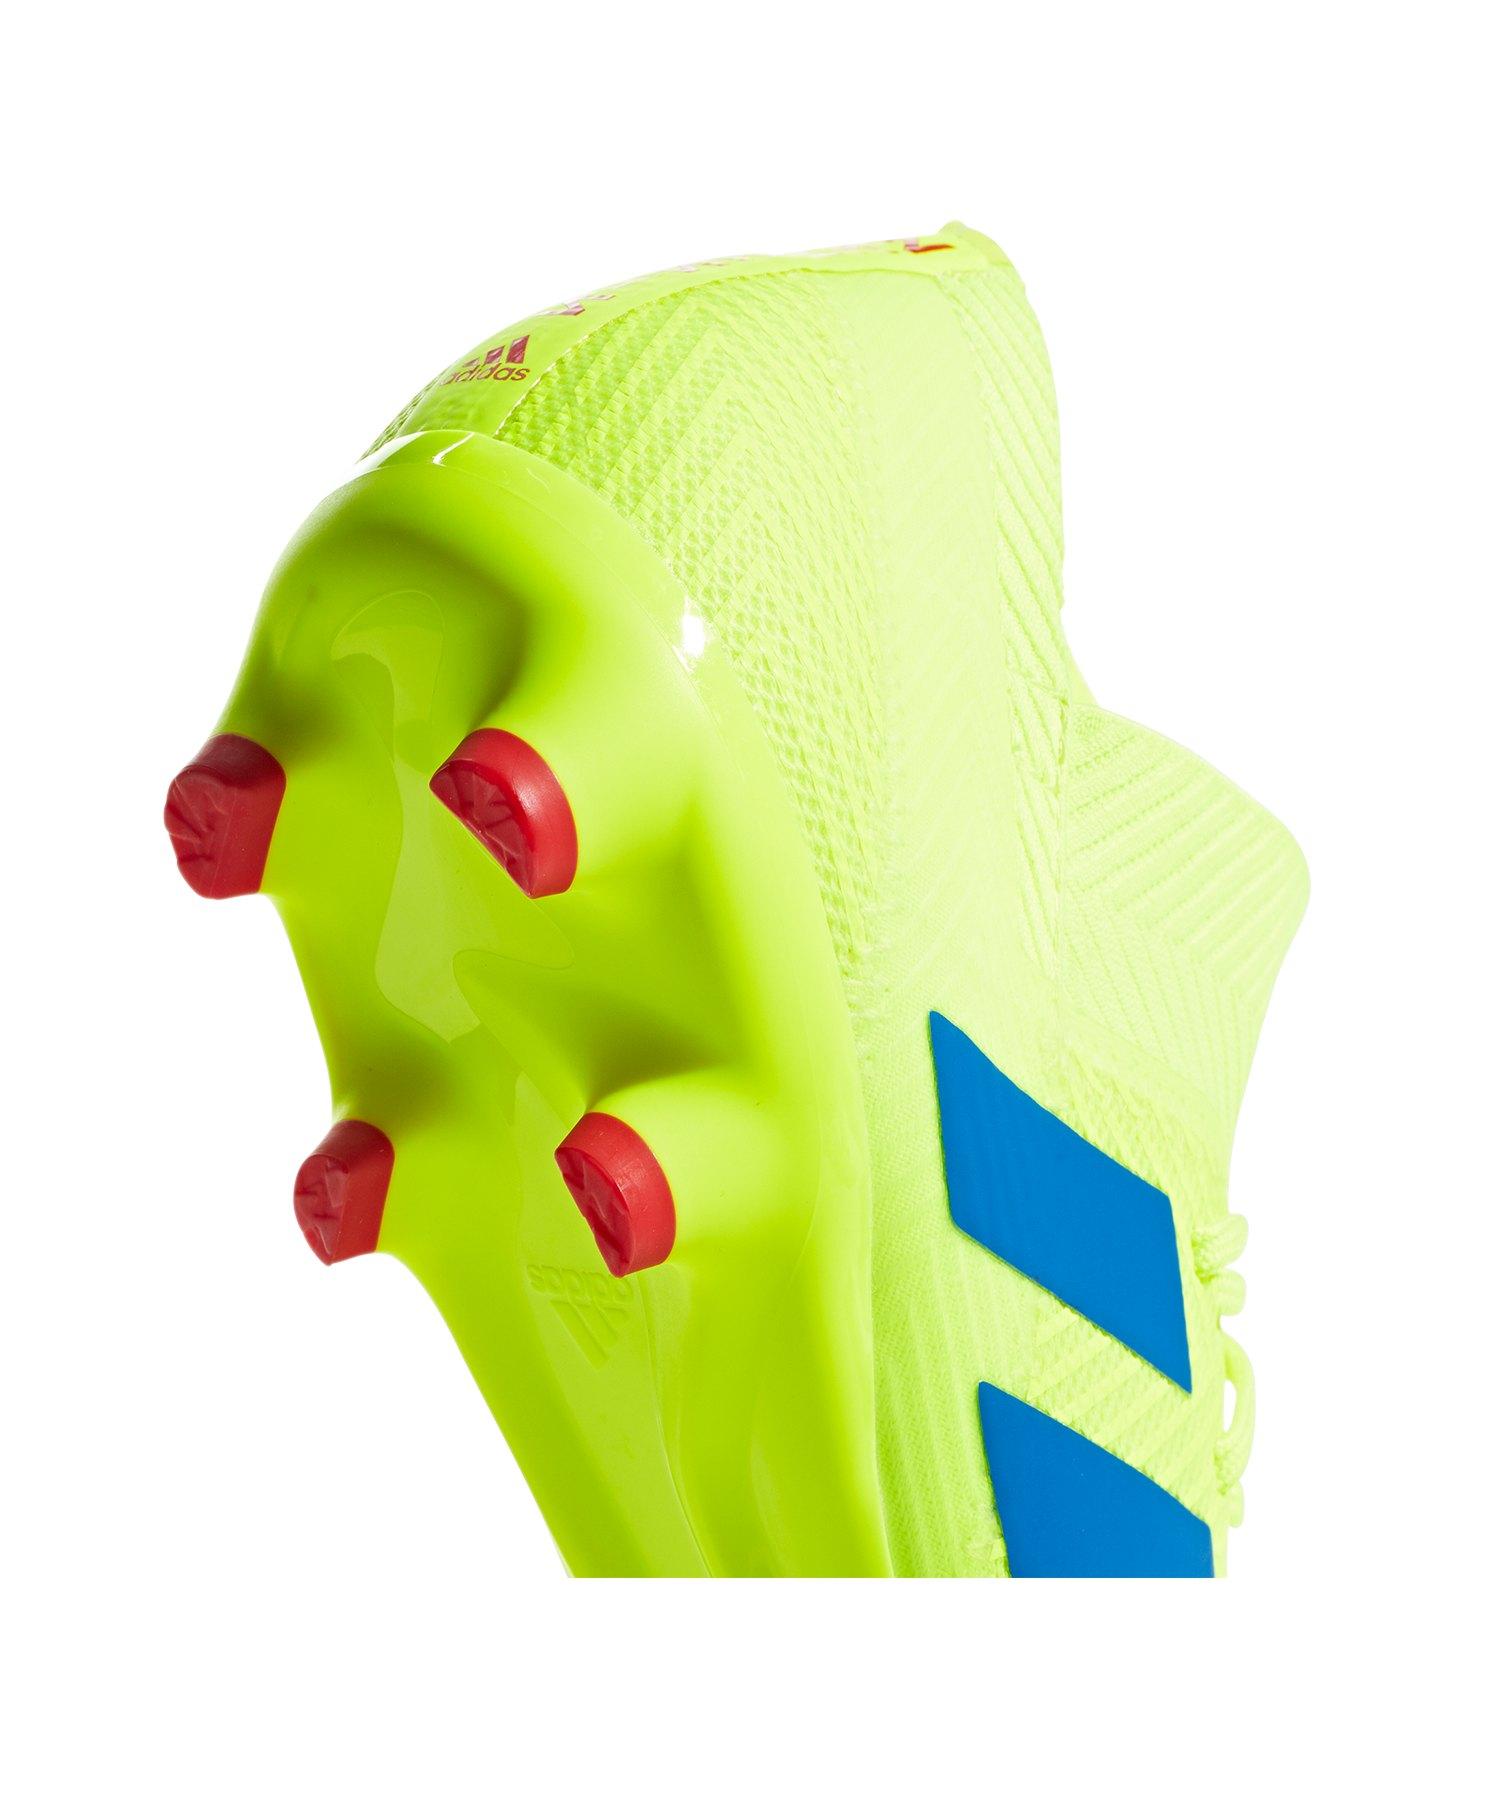 ... adidas NEMEZIZ 18.3 FG Gelb Blau - gelb ... d8abaeae93a